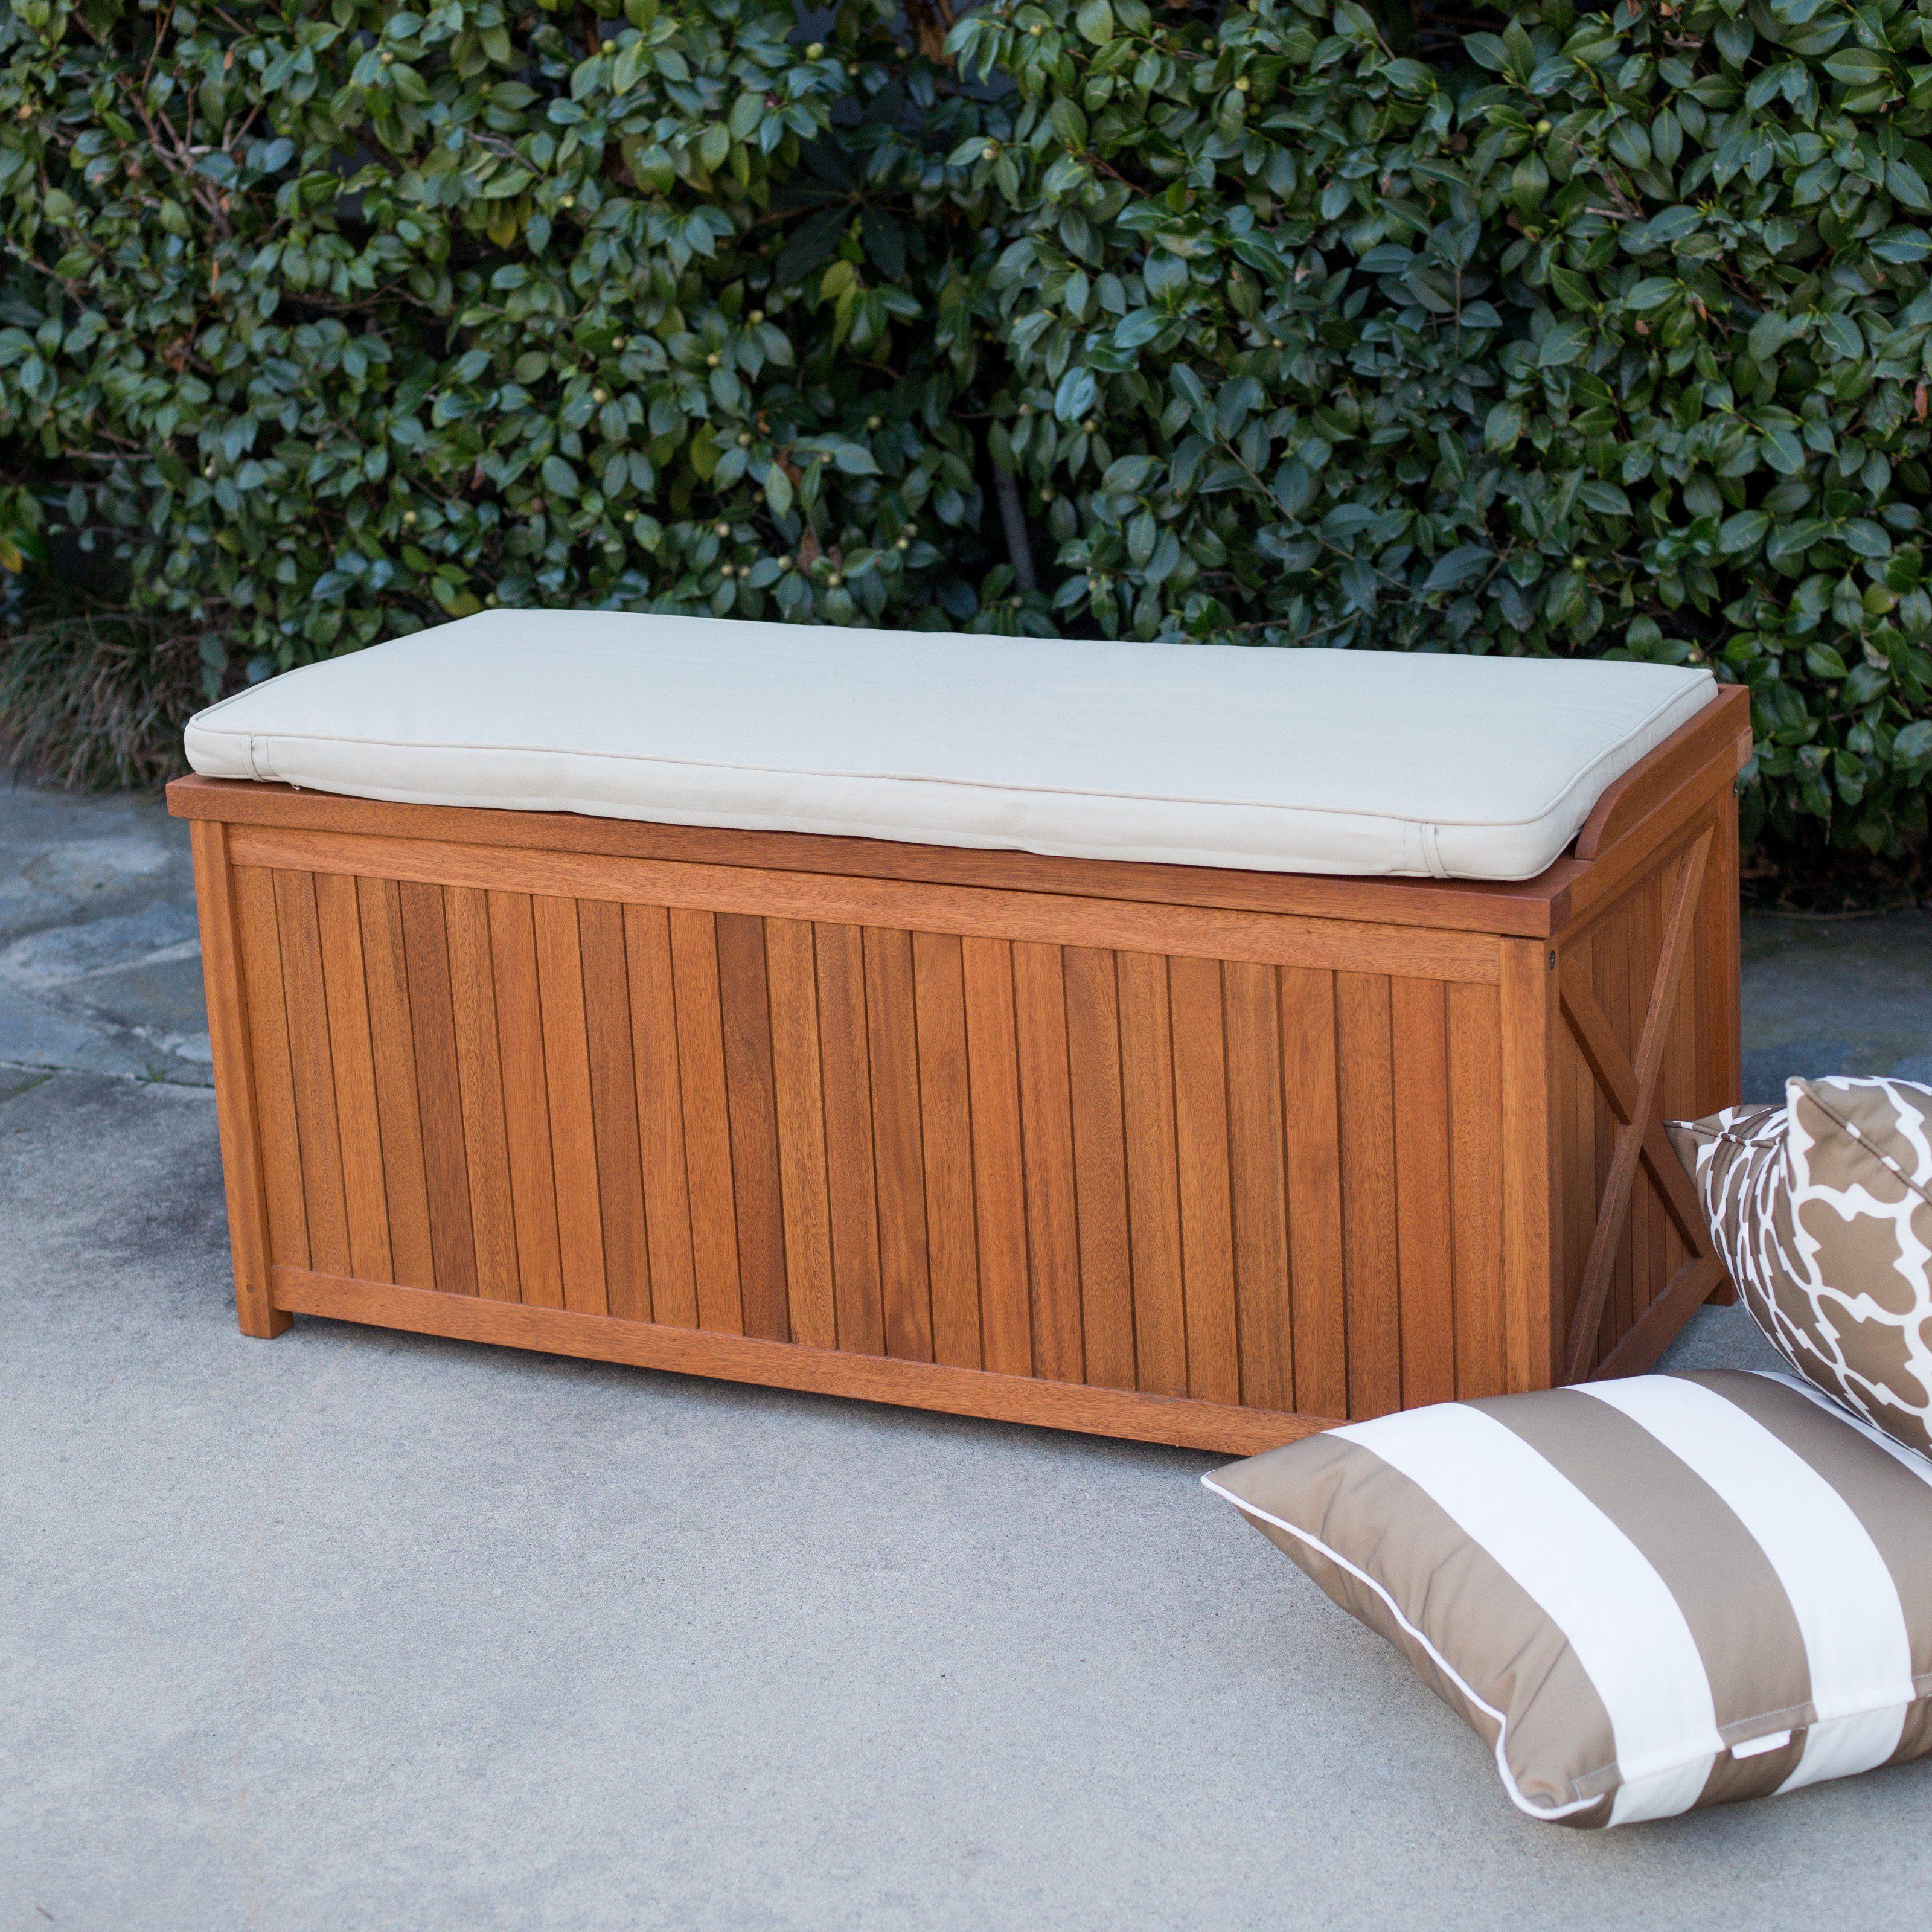 Belham Living Brighton 48 In Outdoor Storage Deck Box With Cushion Natural Outdoor Deck Storage Box Deck Box Storage Outdoor Storage Bench